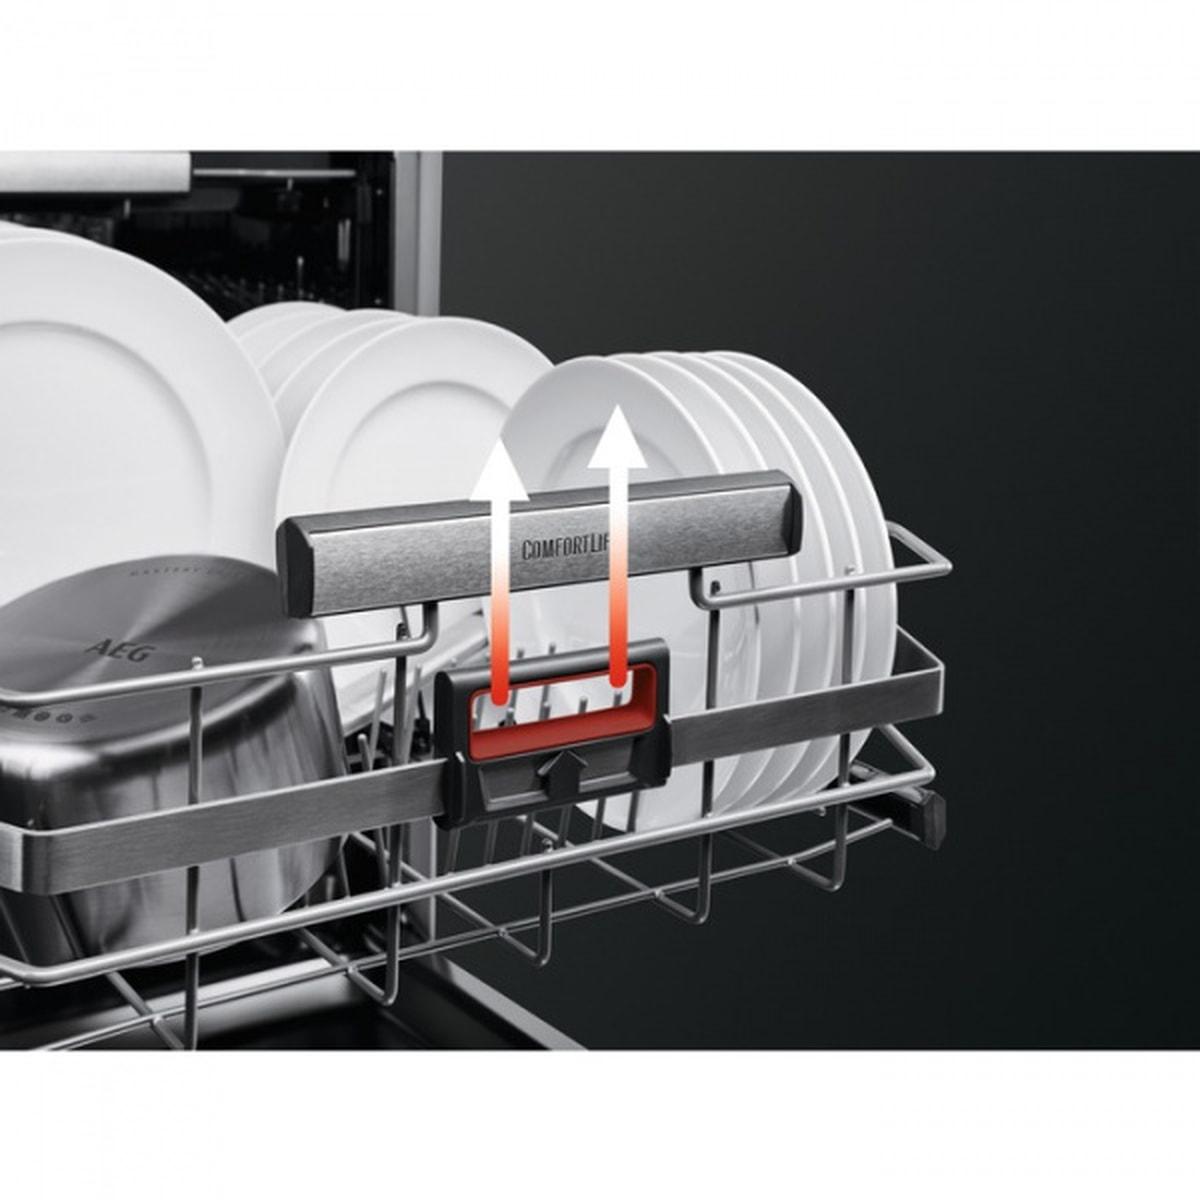 AEG oppvaskmaskin rustfritt stål FFB63806PM